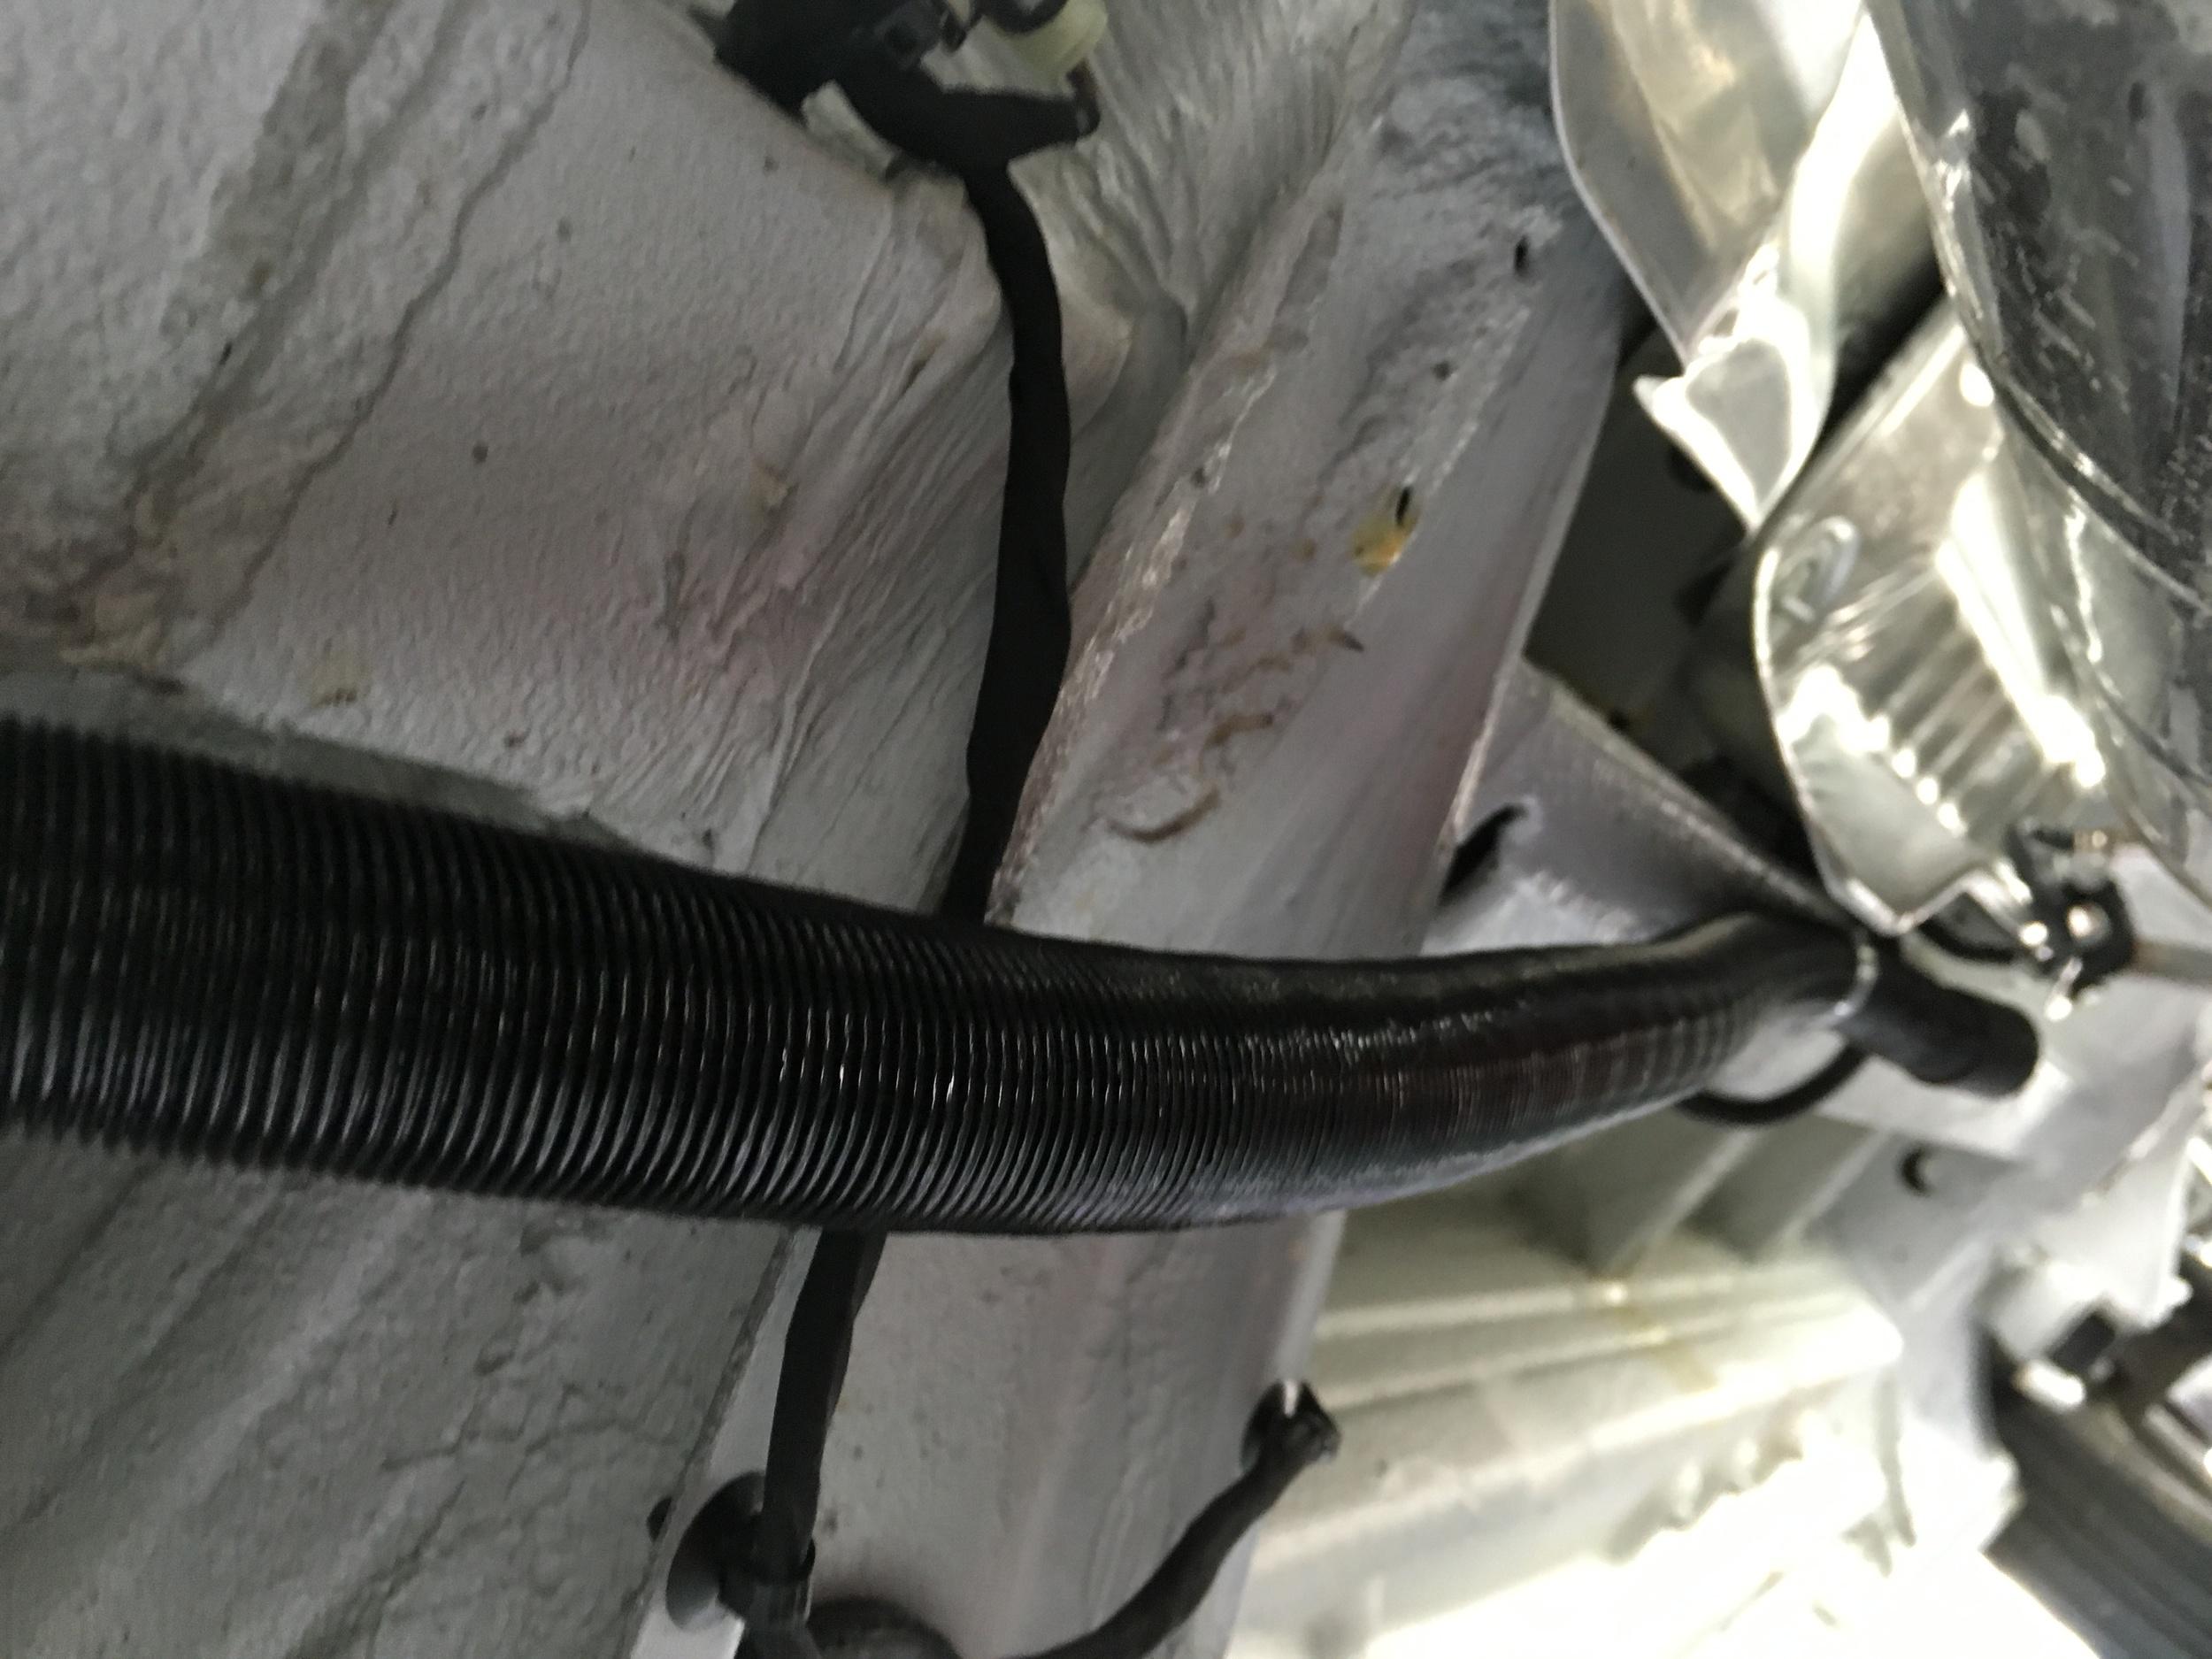 The air intake tube